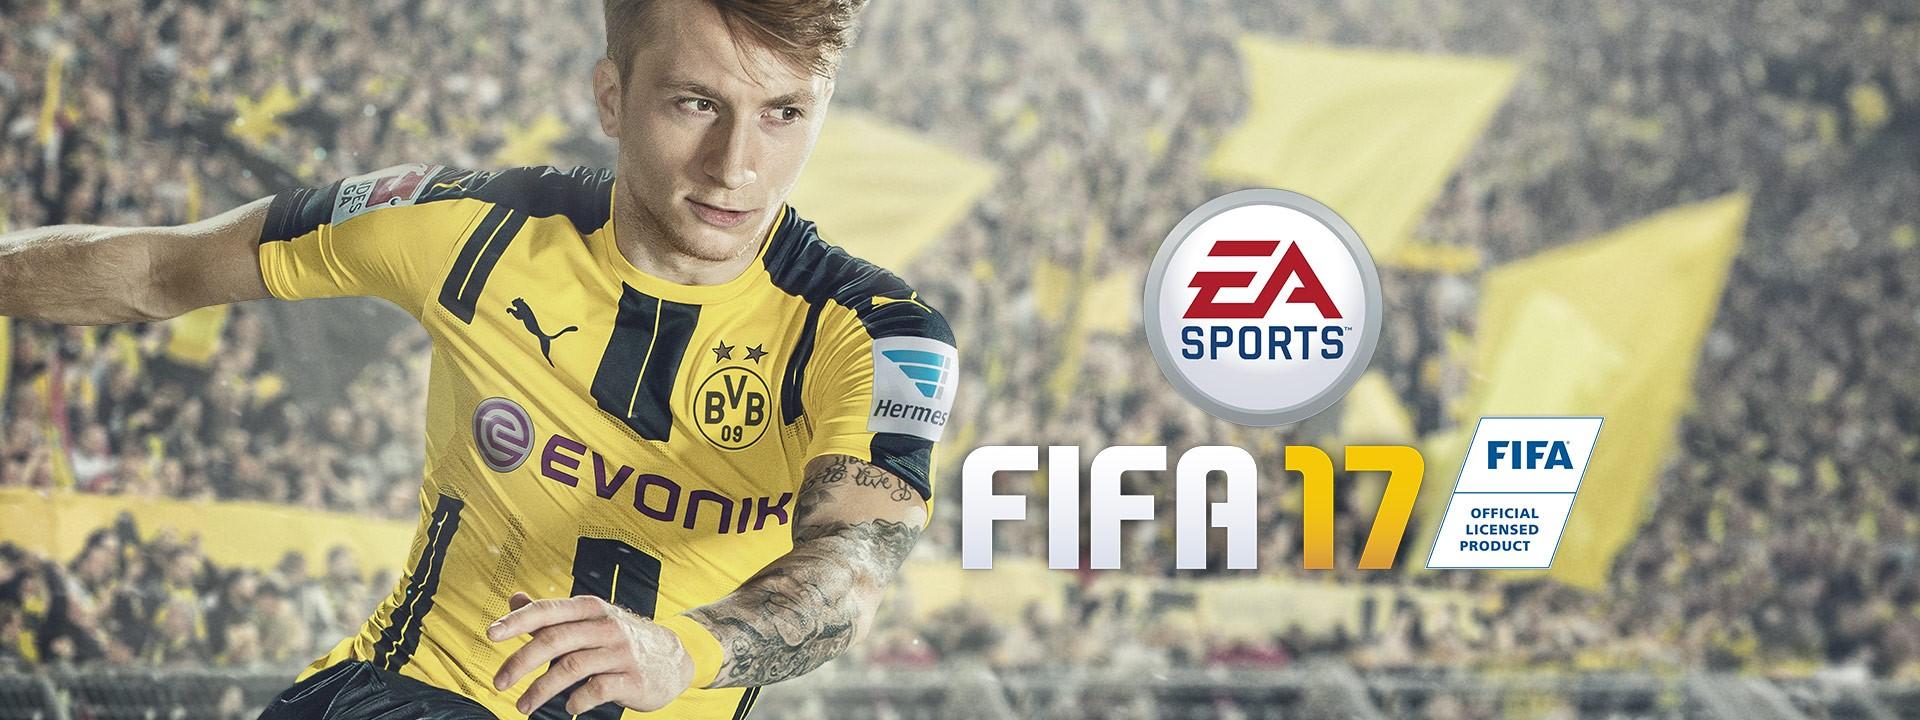 Аккаунт FIFA 17